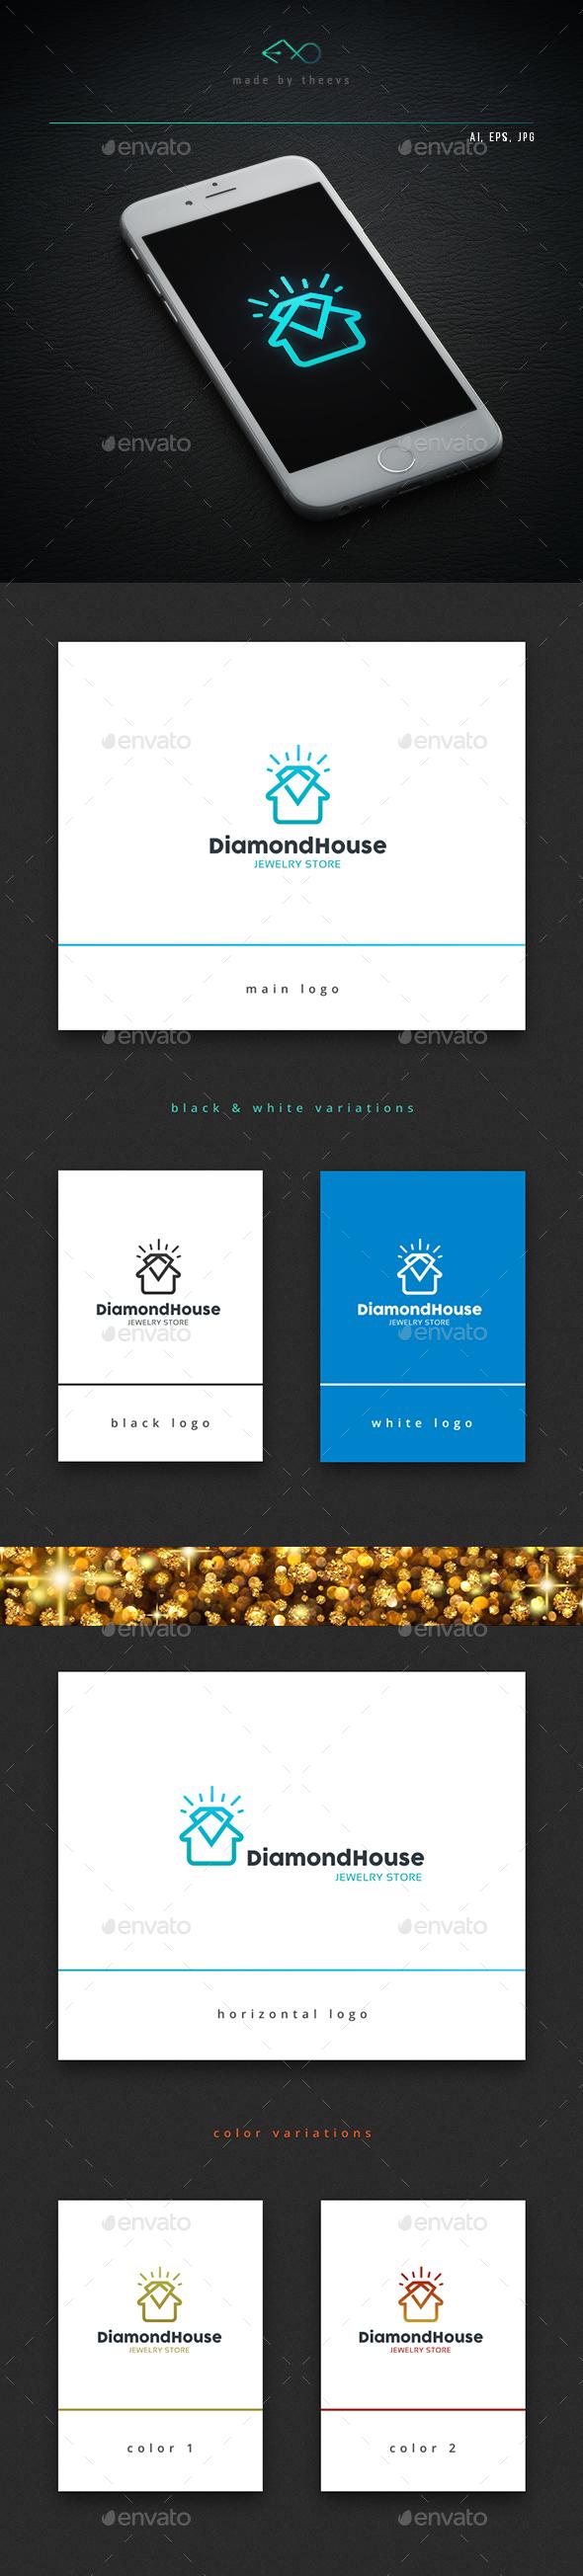 Diamondhouse - Objects Logo Templates